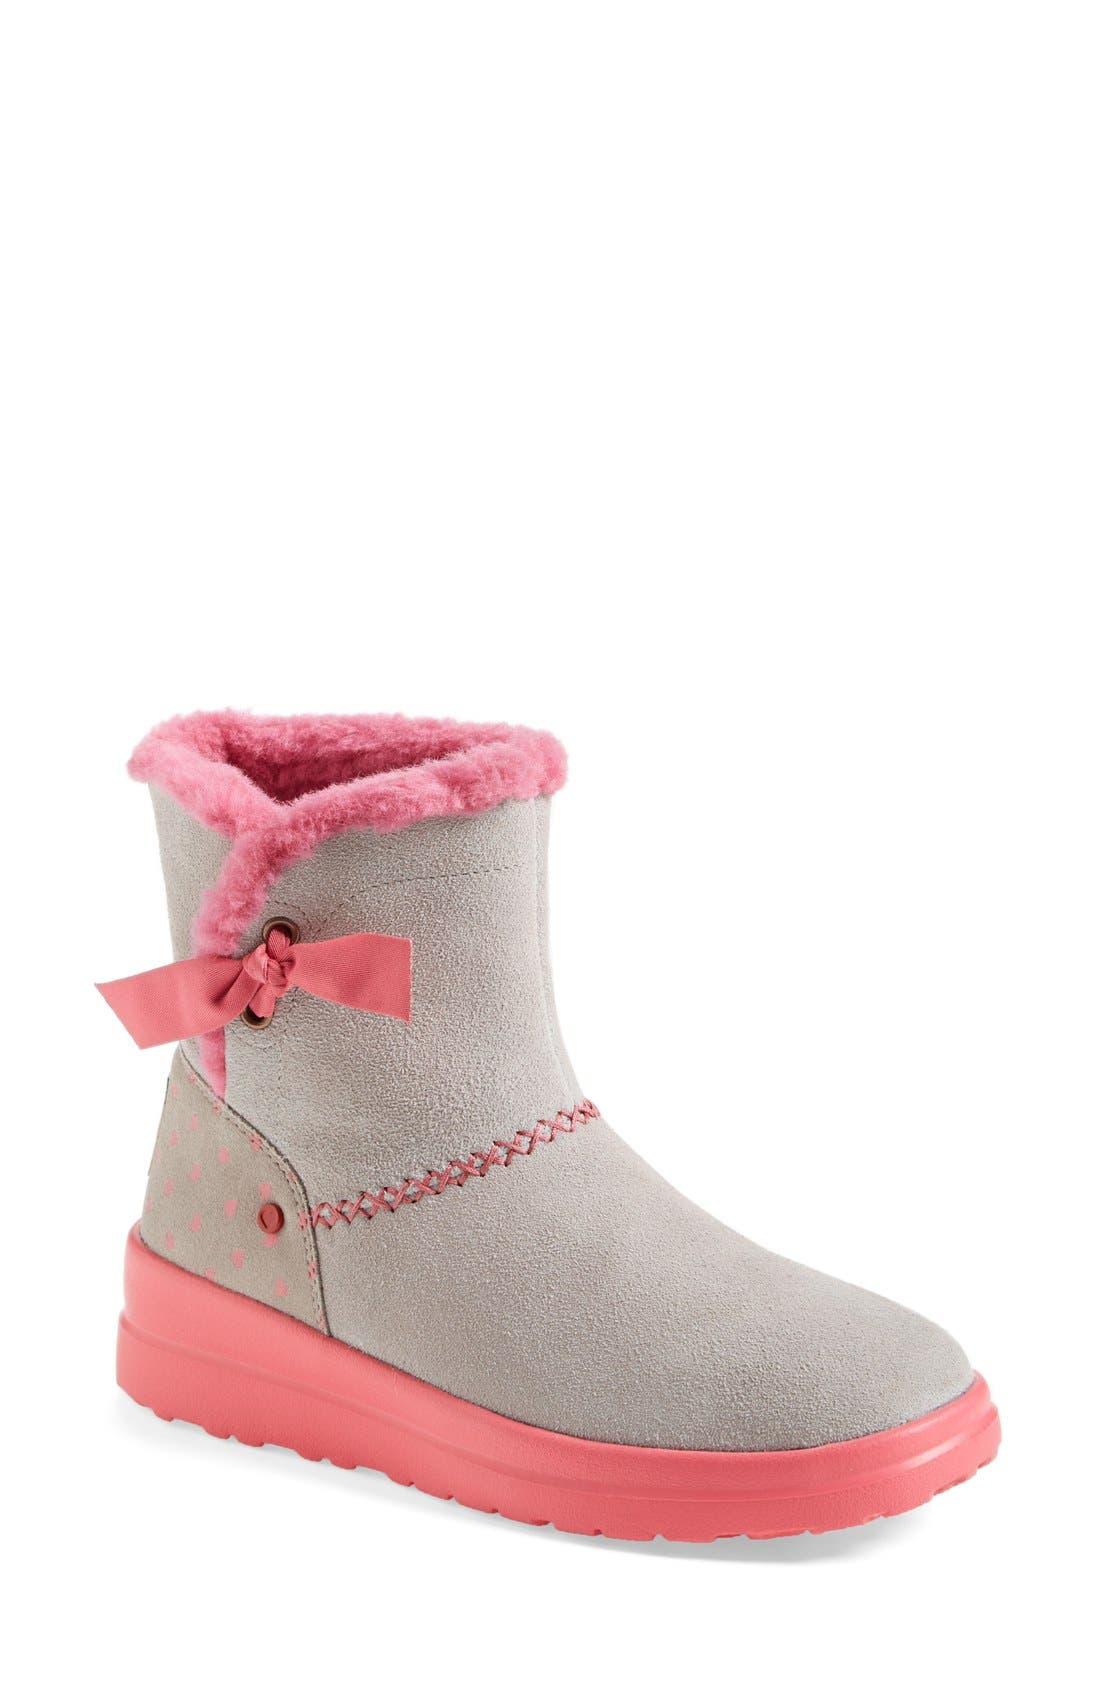 Alternate Image 1 Selected - I Heart UGG™ by UGG® Australia 'I Heart Knotty' Boot